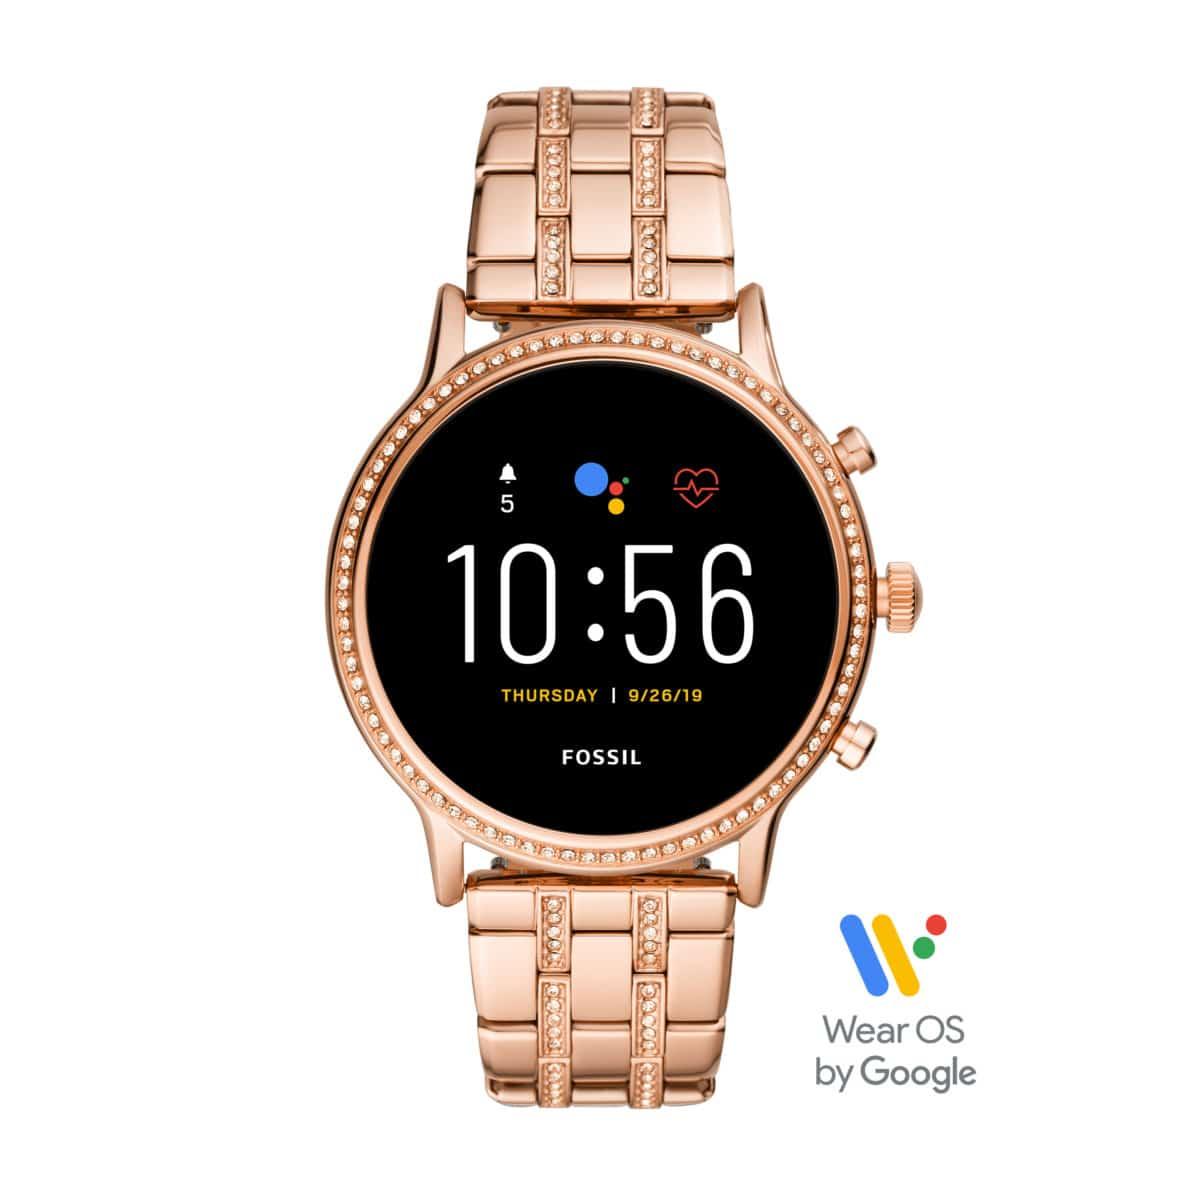 Fossil Gen 5 Smartwatch 7